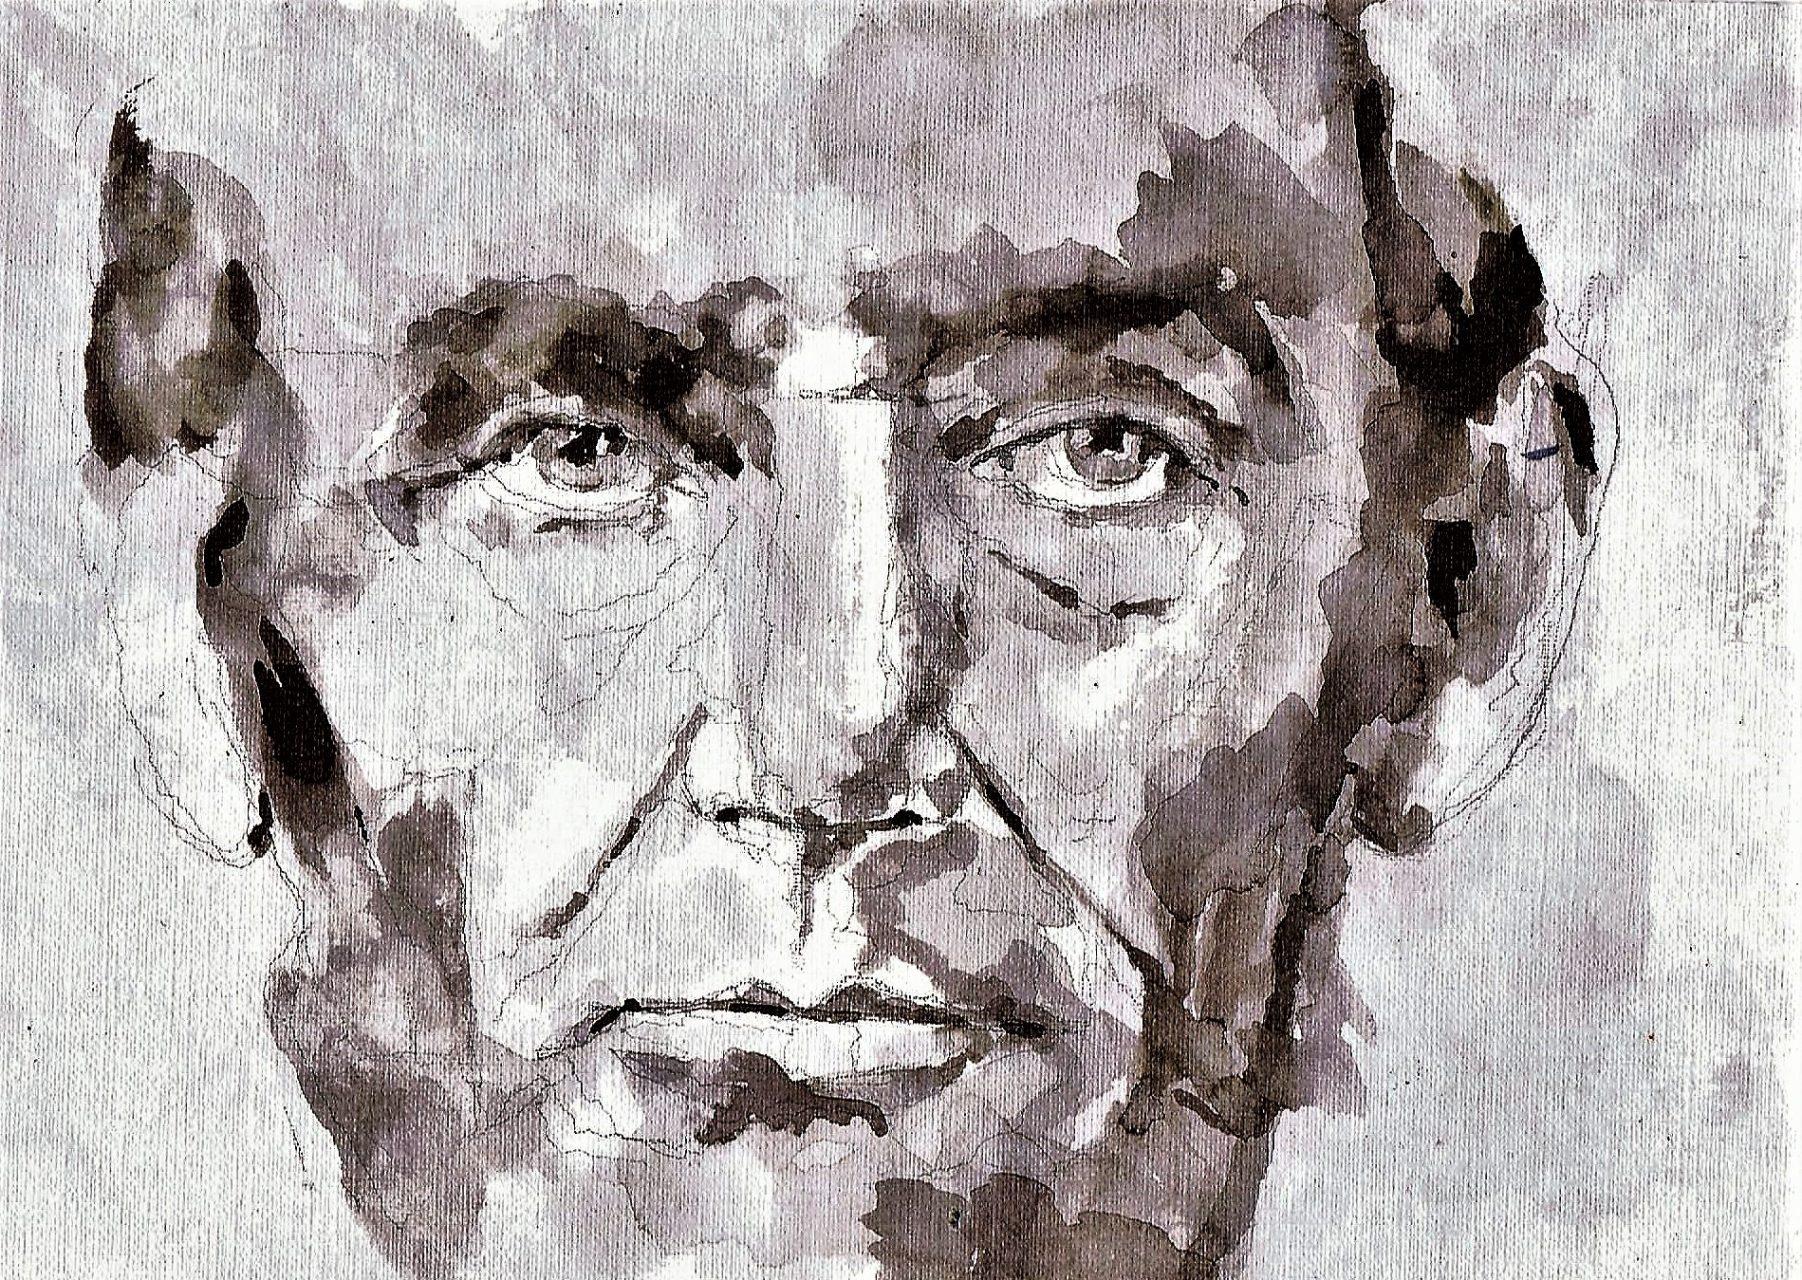 365 dagen een portret 84 Abraham Lincoln, 16e president VS Gewassen inkt 19c25